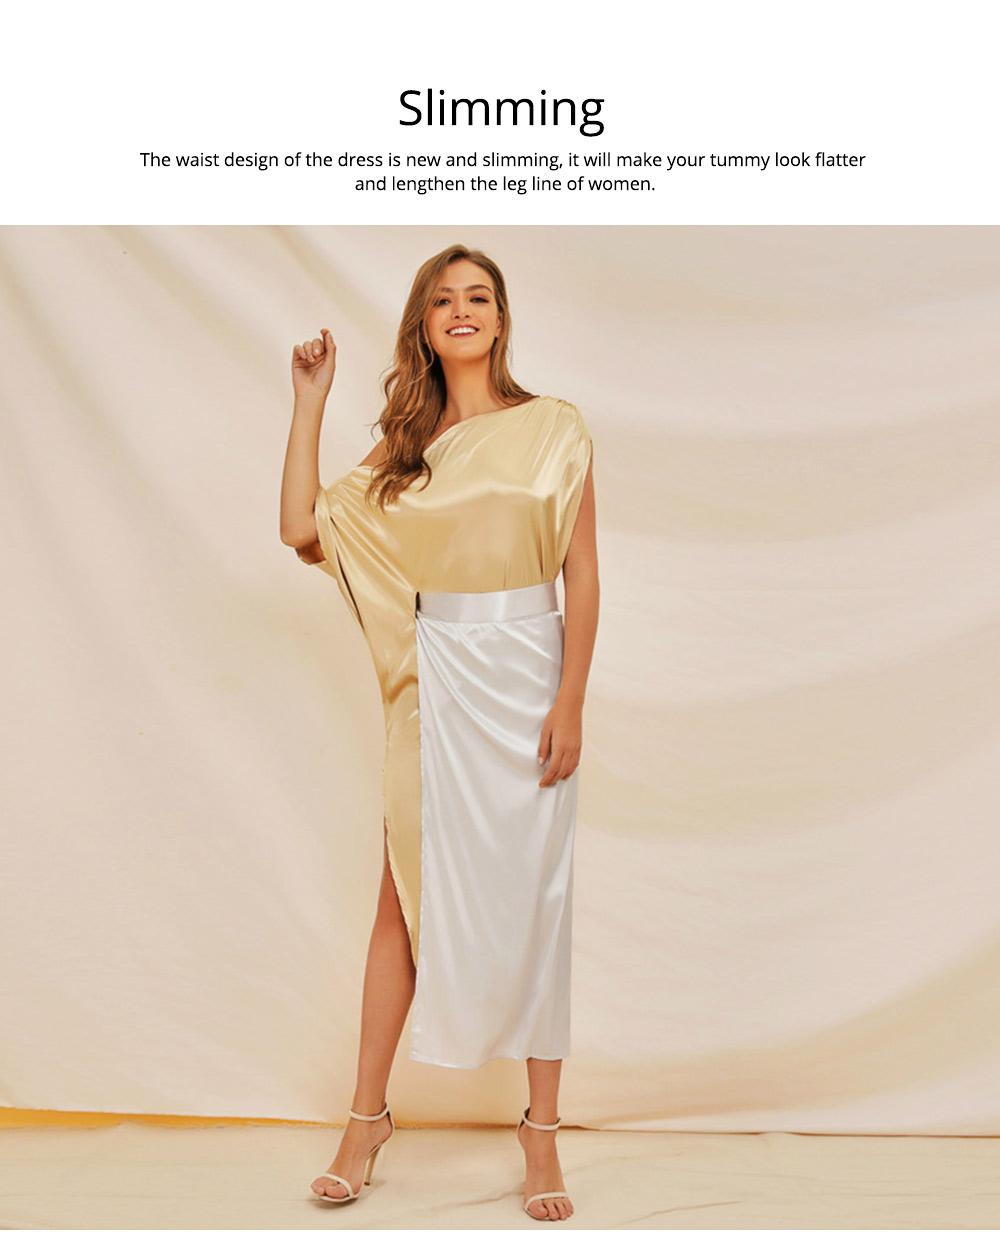 Sloping Shoulder Women Dress, Sexy Fashion Champagne Irregular Casual Dress, High Slit Short Sleeve Elegant Dress 2019 New 5